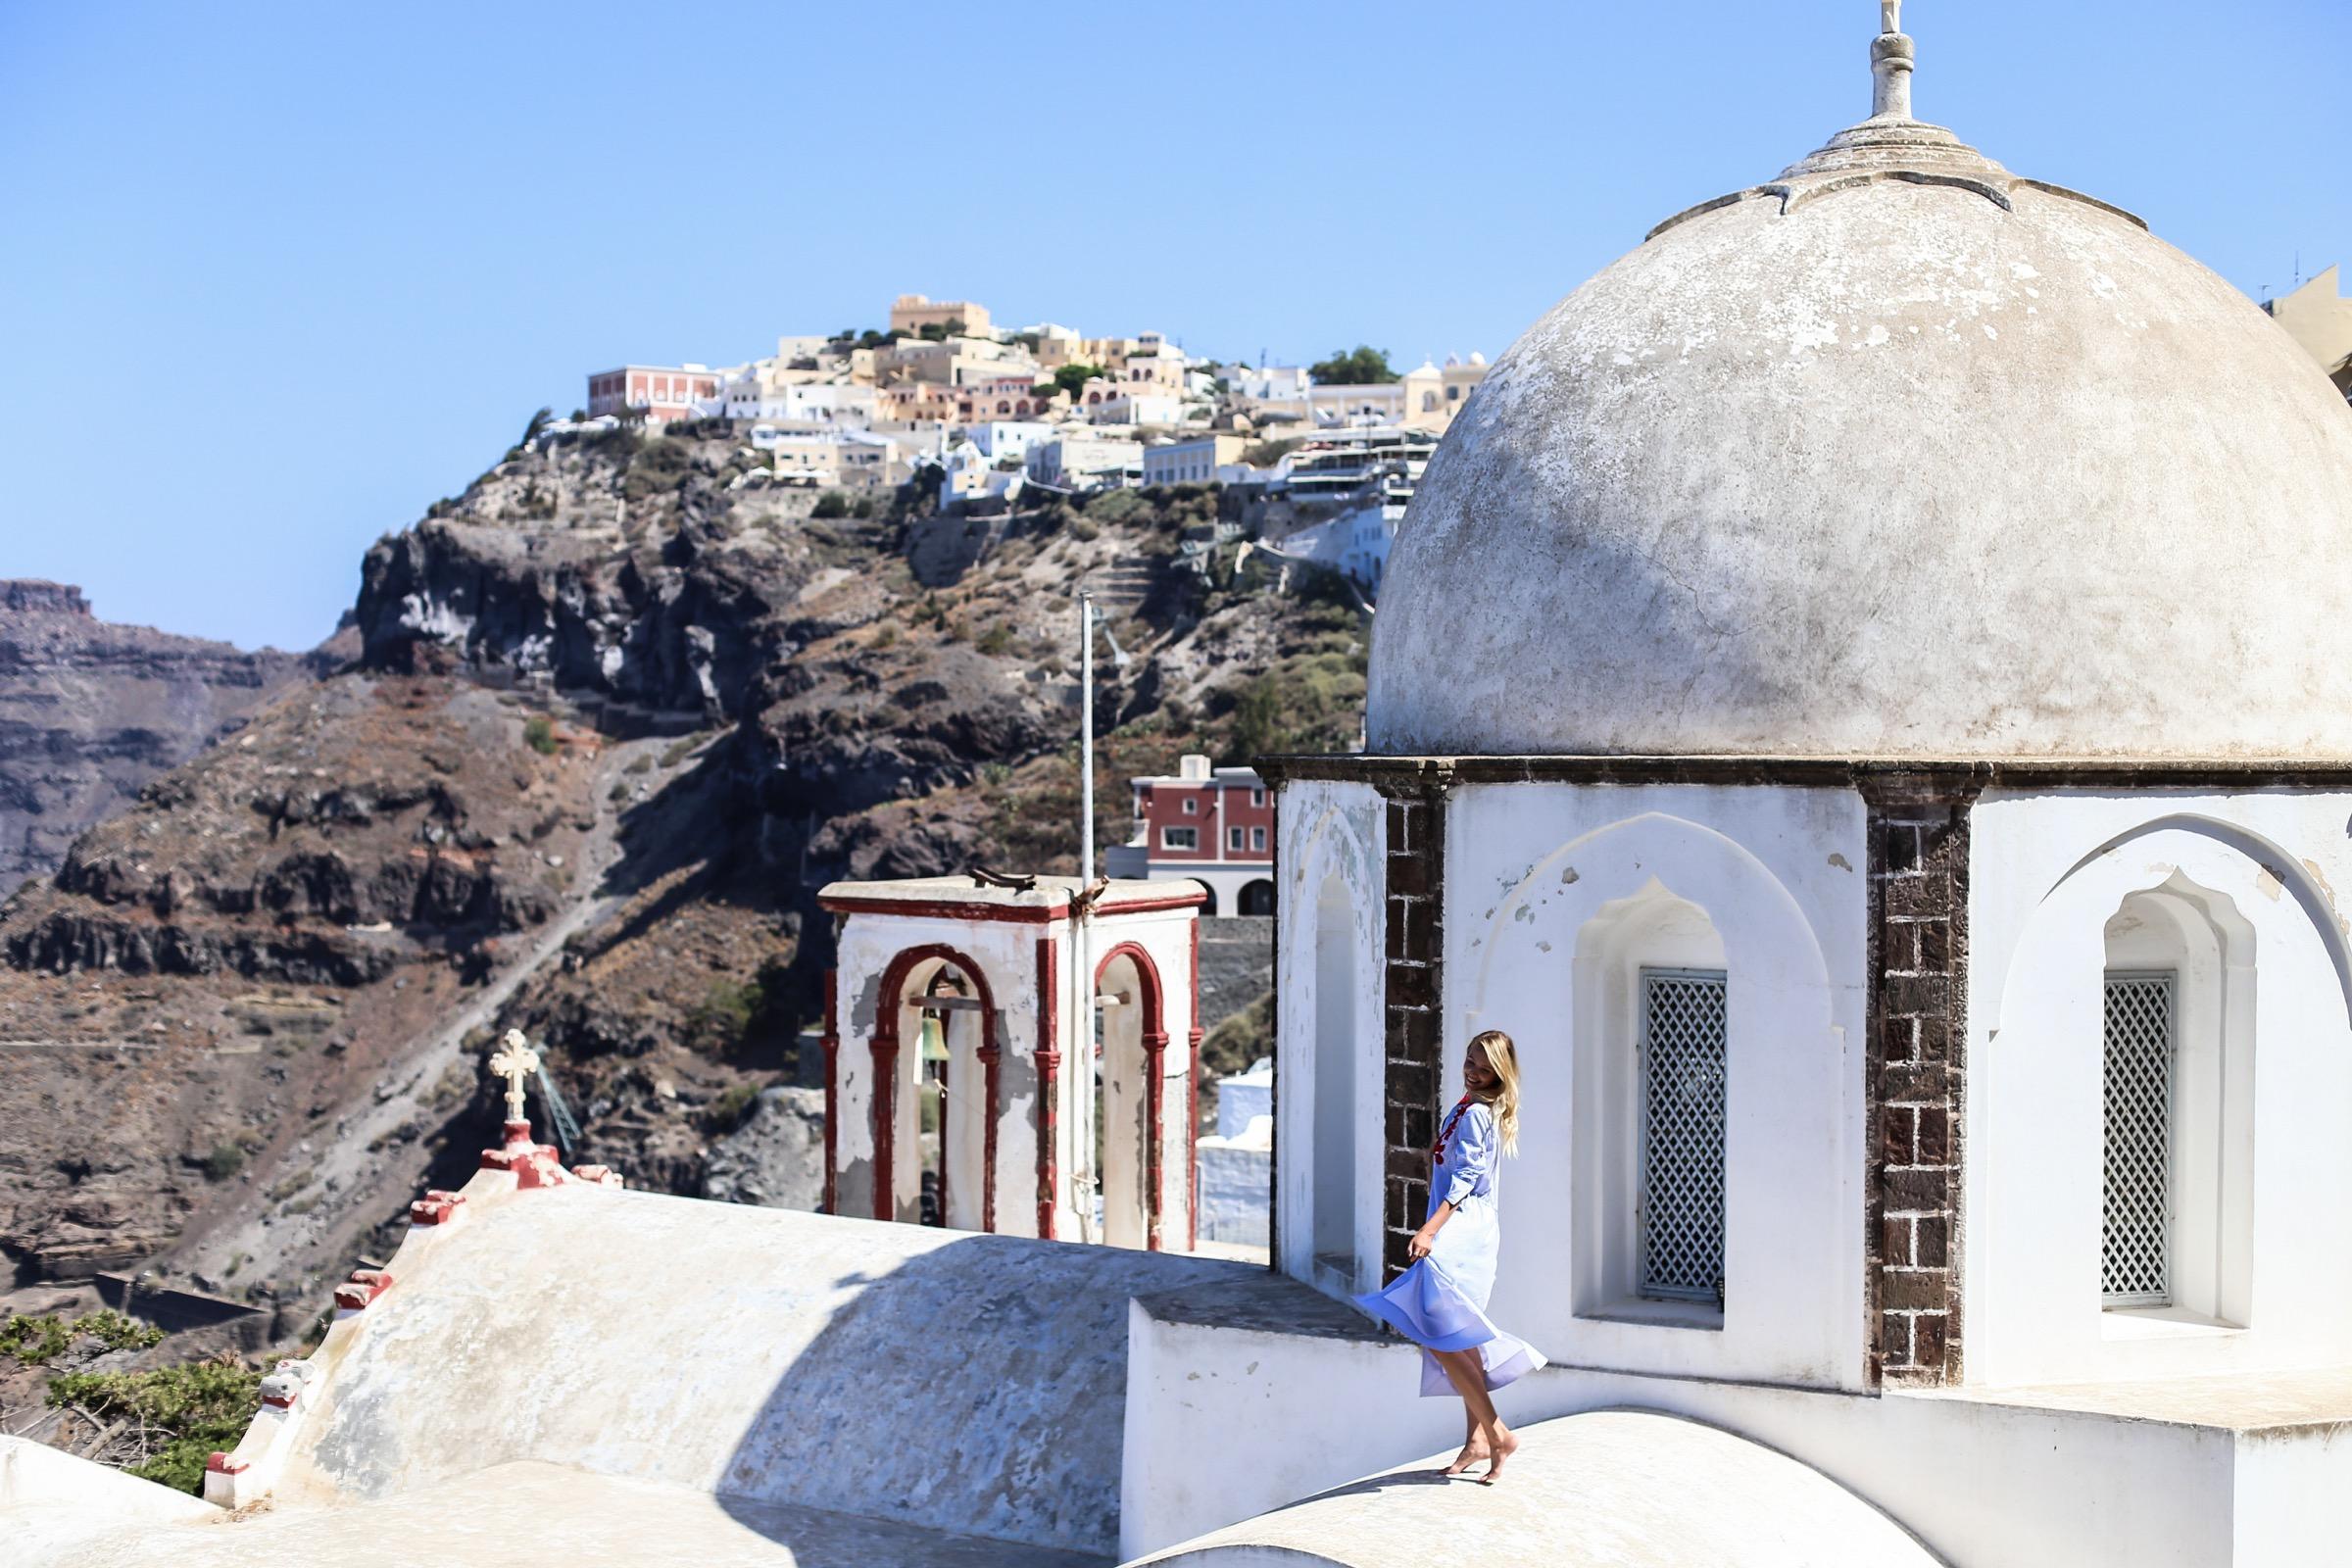 Tory tunic & Aquazzura heels | Santorini